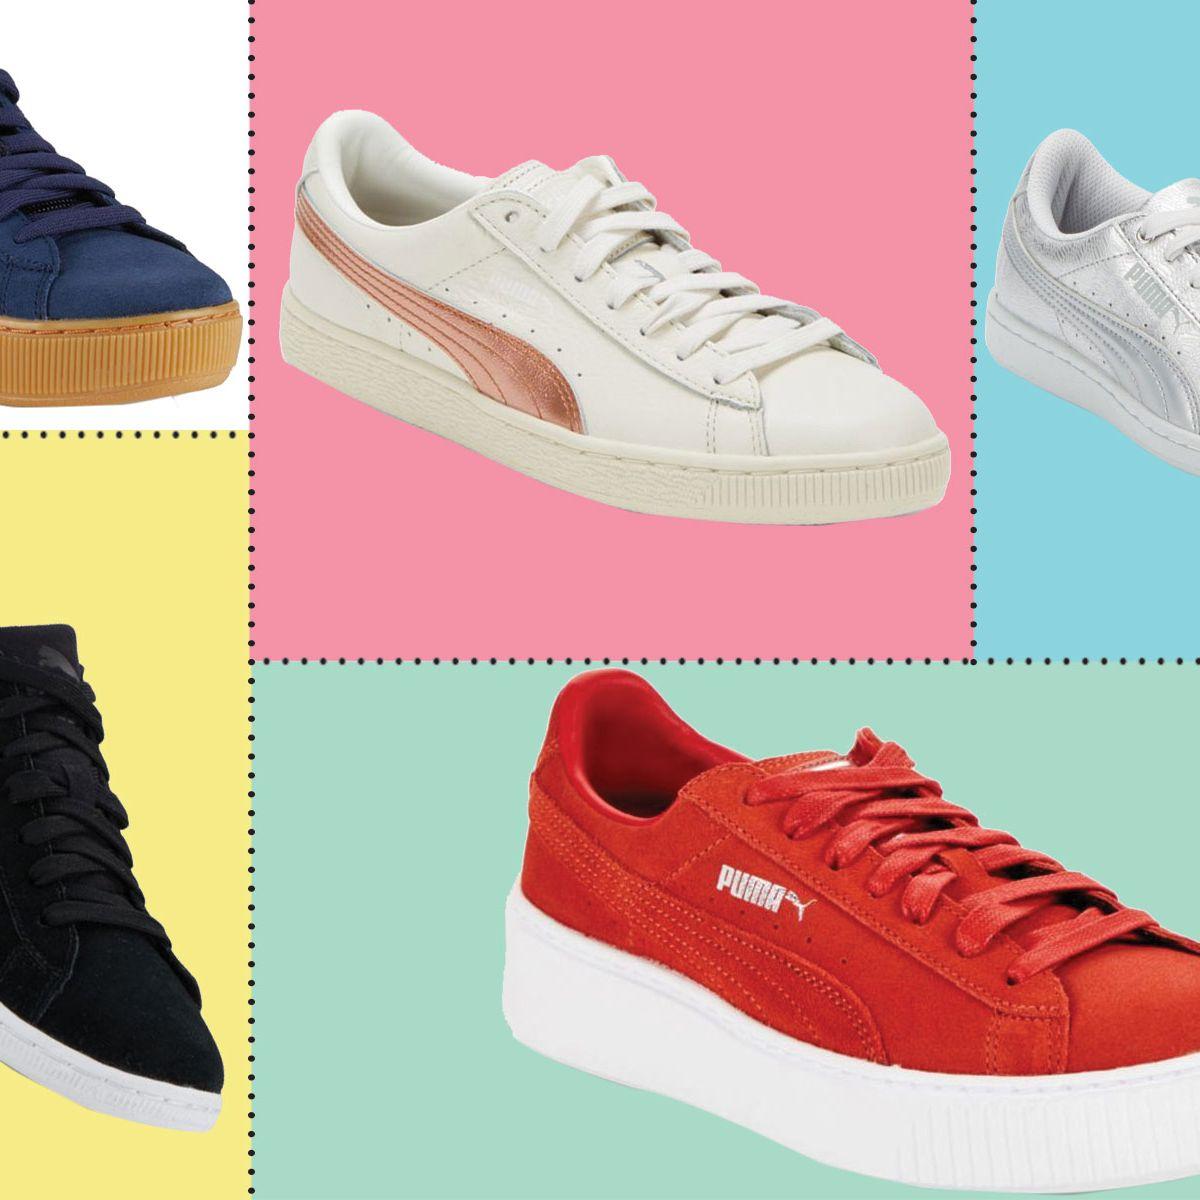 Puma Sneakers on Sale   The Strategist   New York Magazine